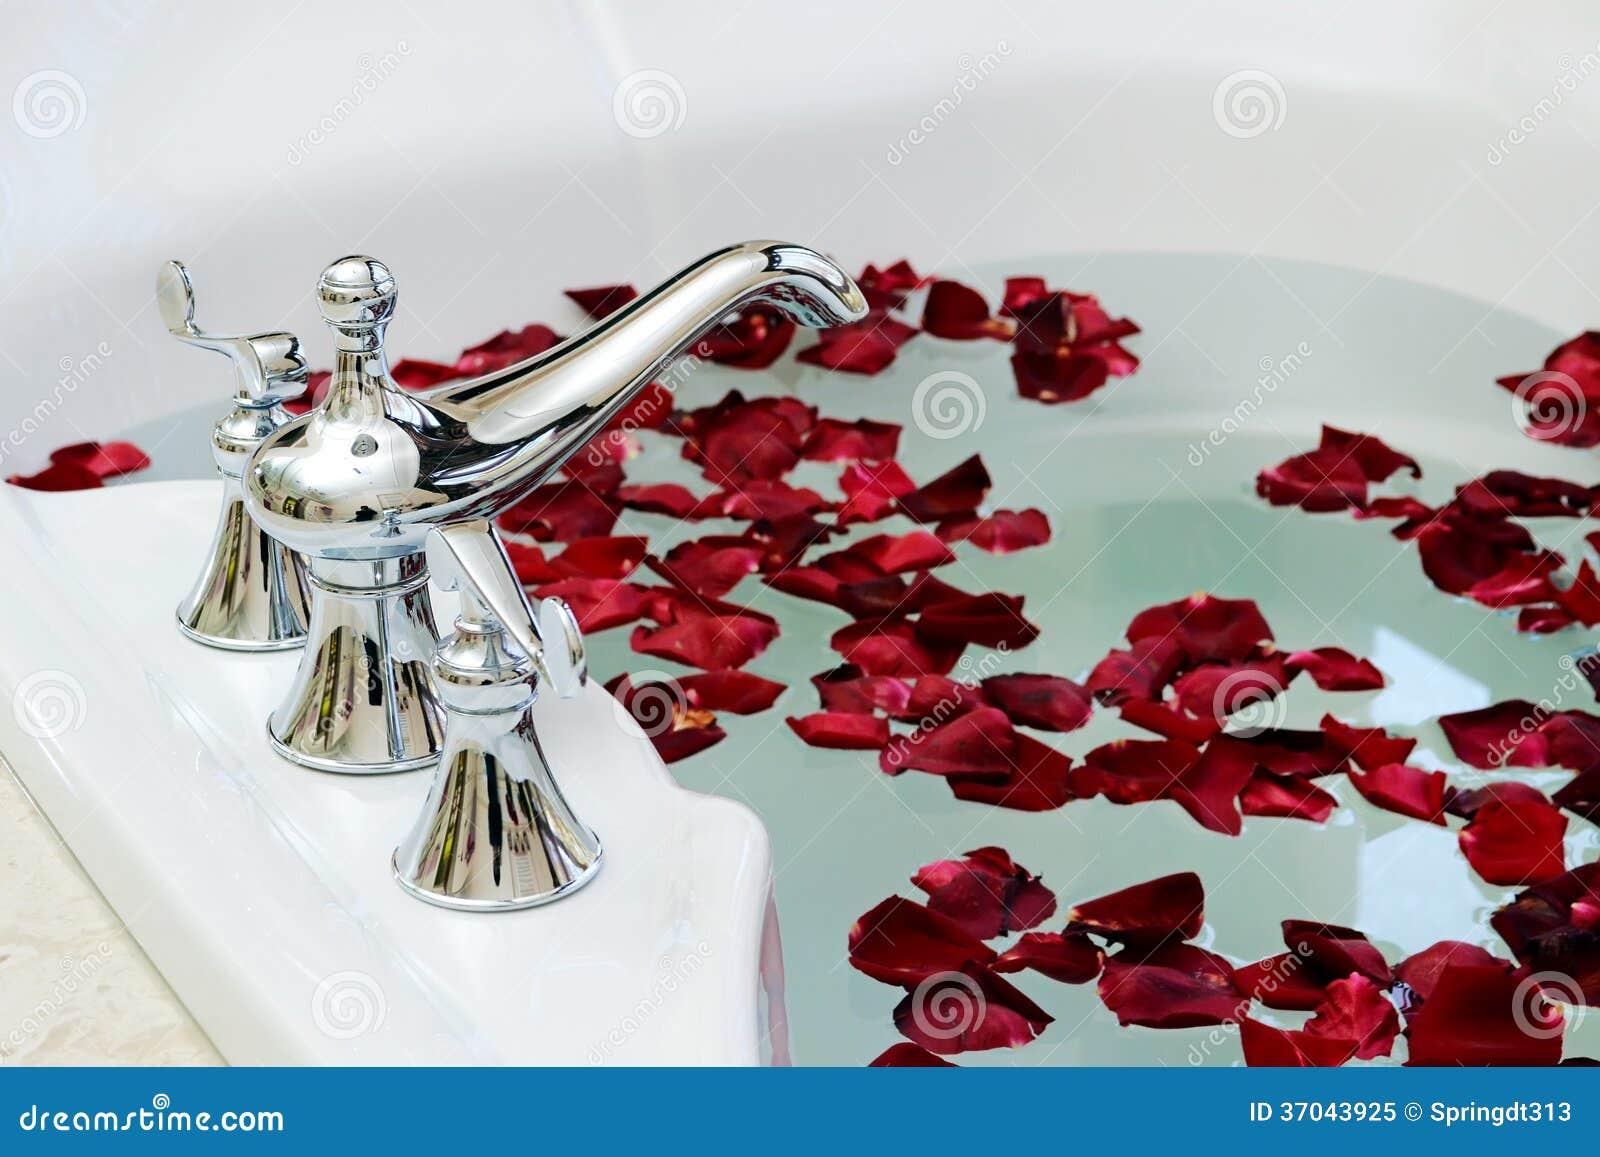 baignoire de rose image stock image du indoors blanc 37043925. Black Bedroom Furniture Sets. Home Design Ideas